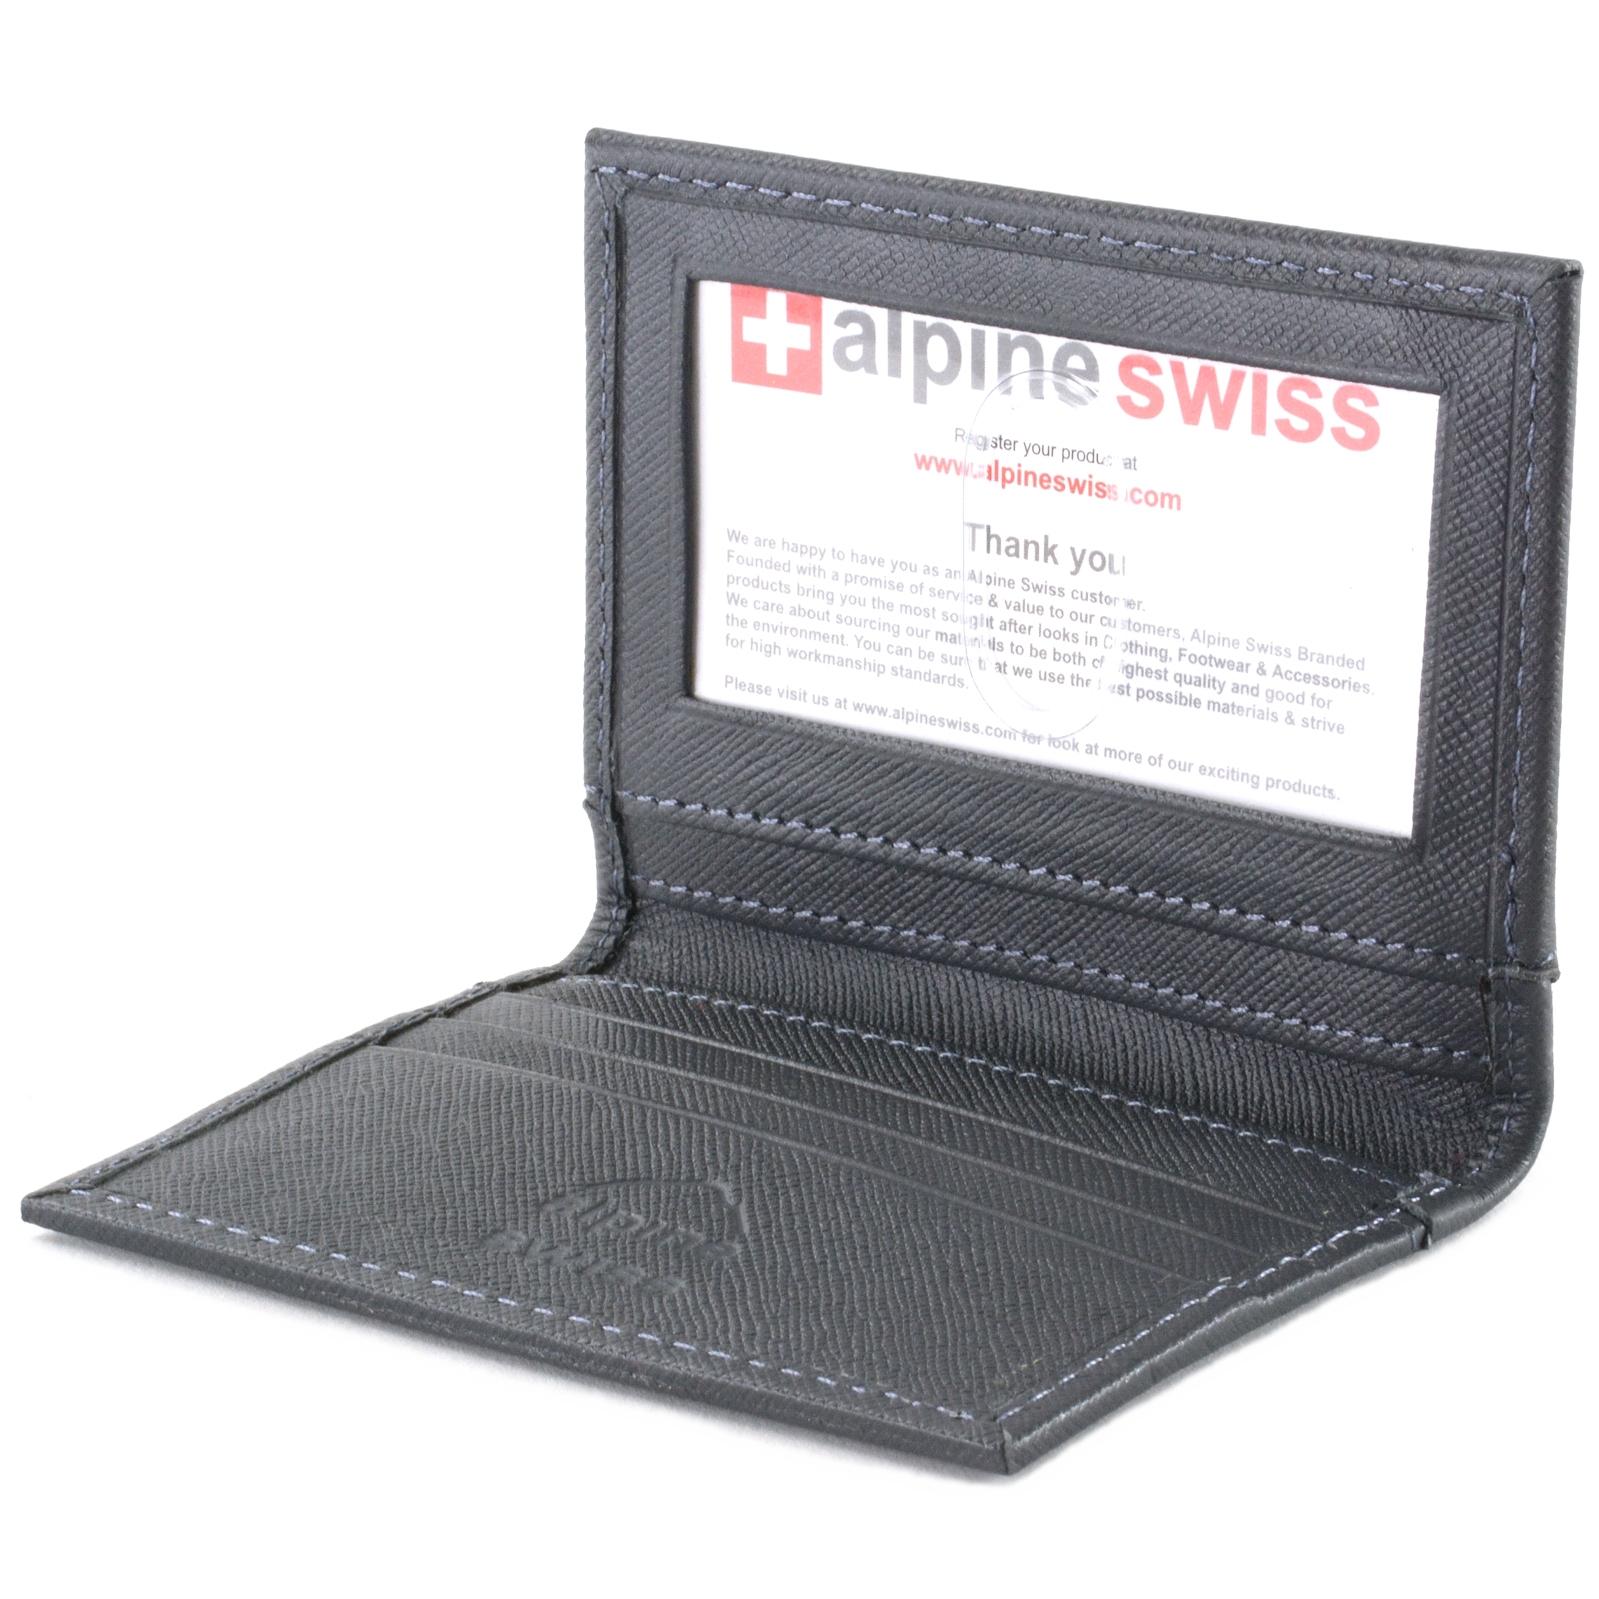 Alpine Swiss Thin Front Pocket Wallet Business Card Case 2 ID Window 6 Card Slot